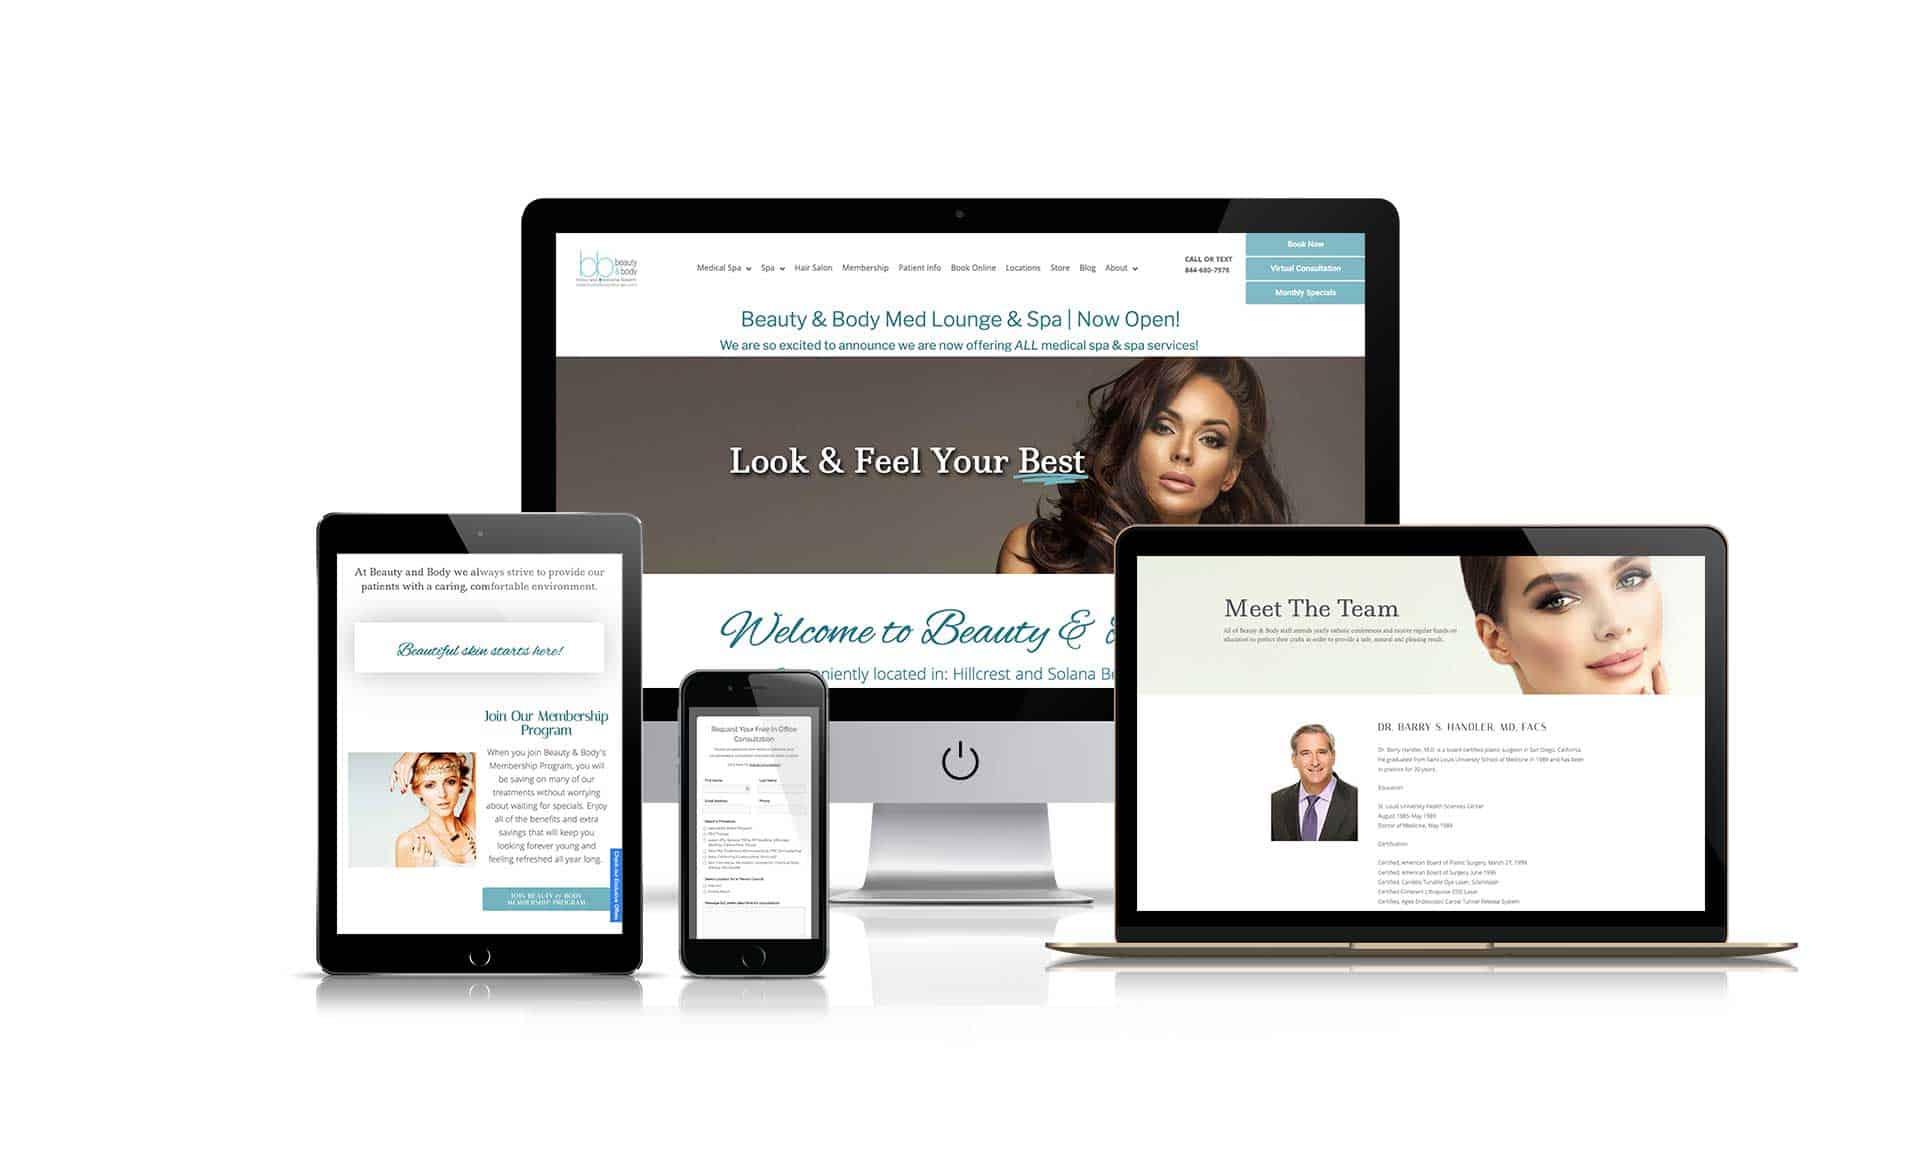 Beauty and Body Medlounge Spa - Website Design - Hillcrest